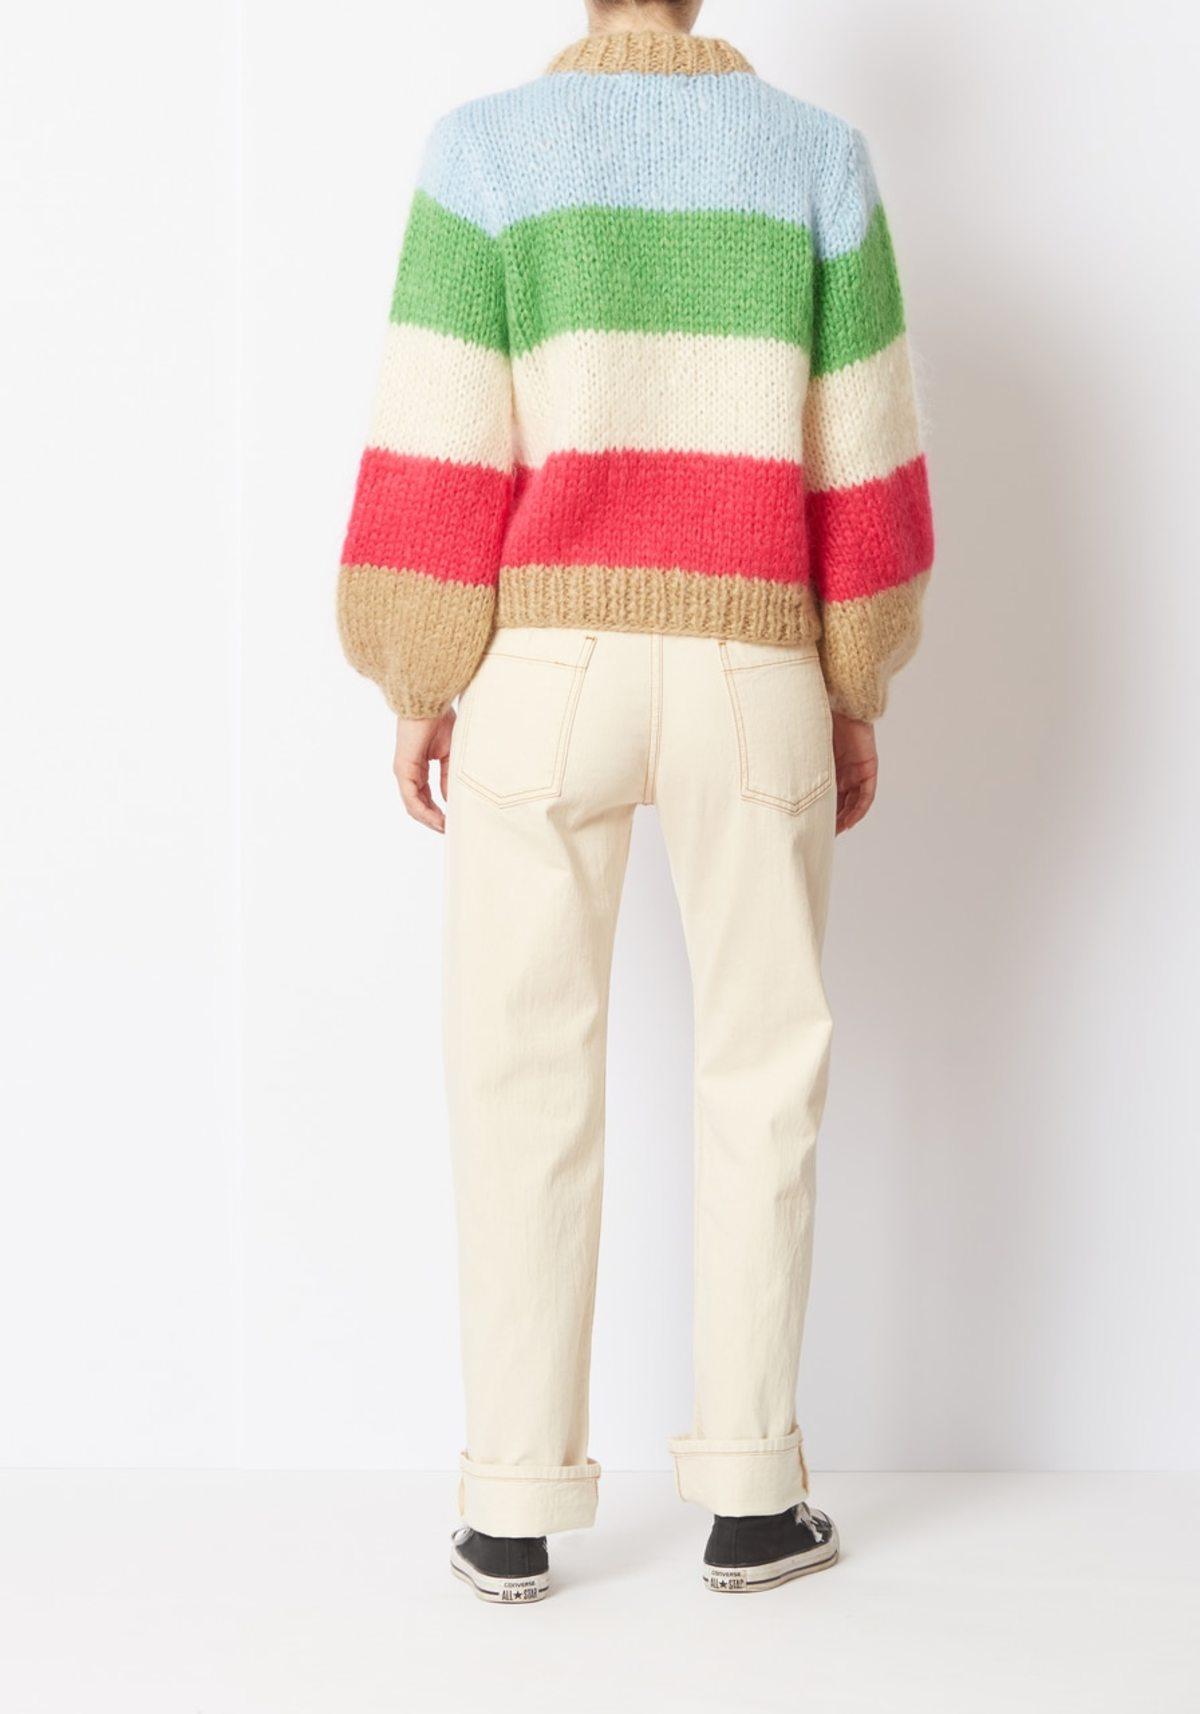 dbb03d43d4e22 Ganni Striped Julliard Mohair Sweater - Color Blocked